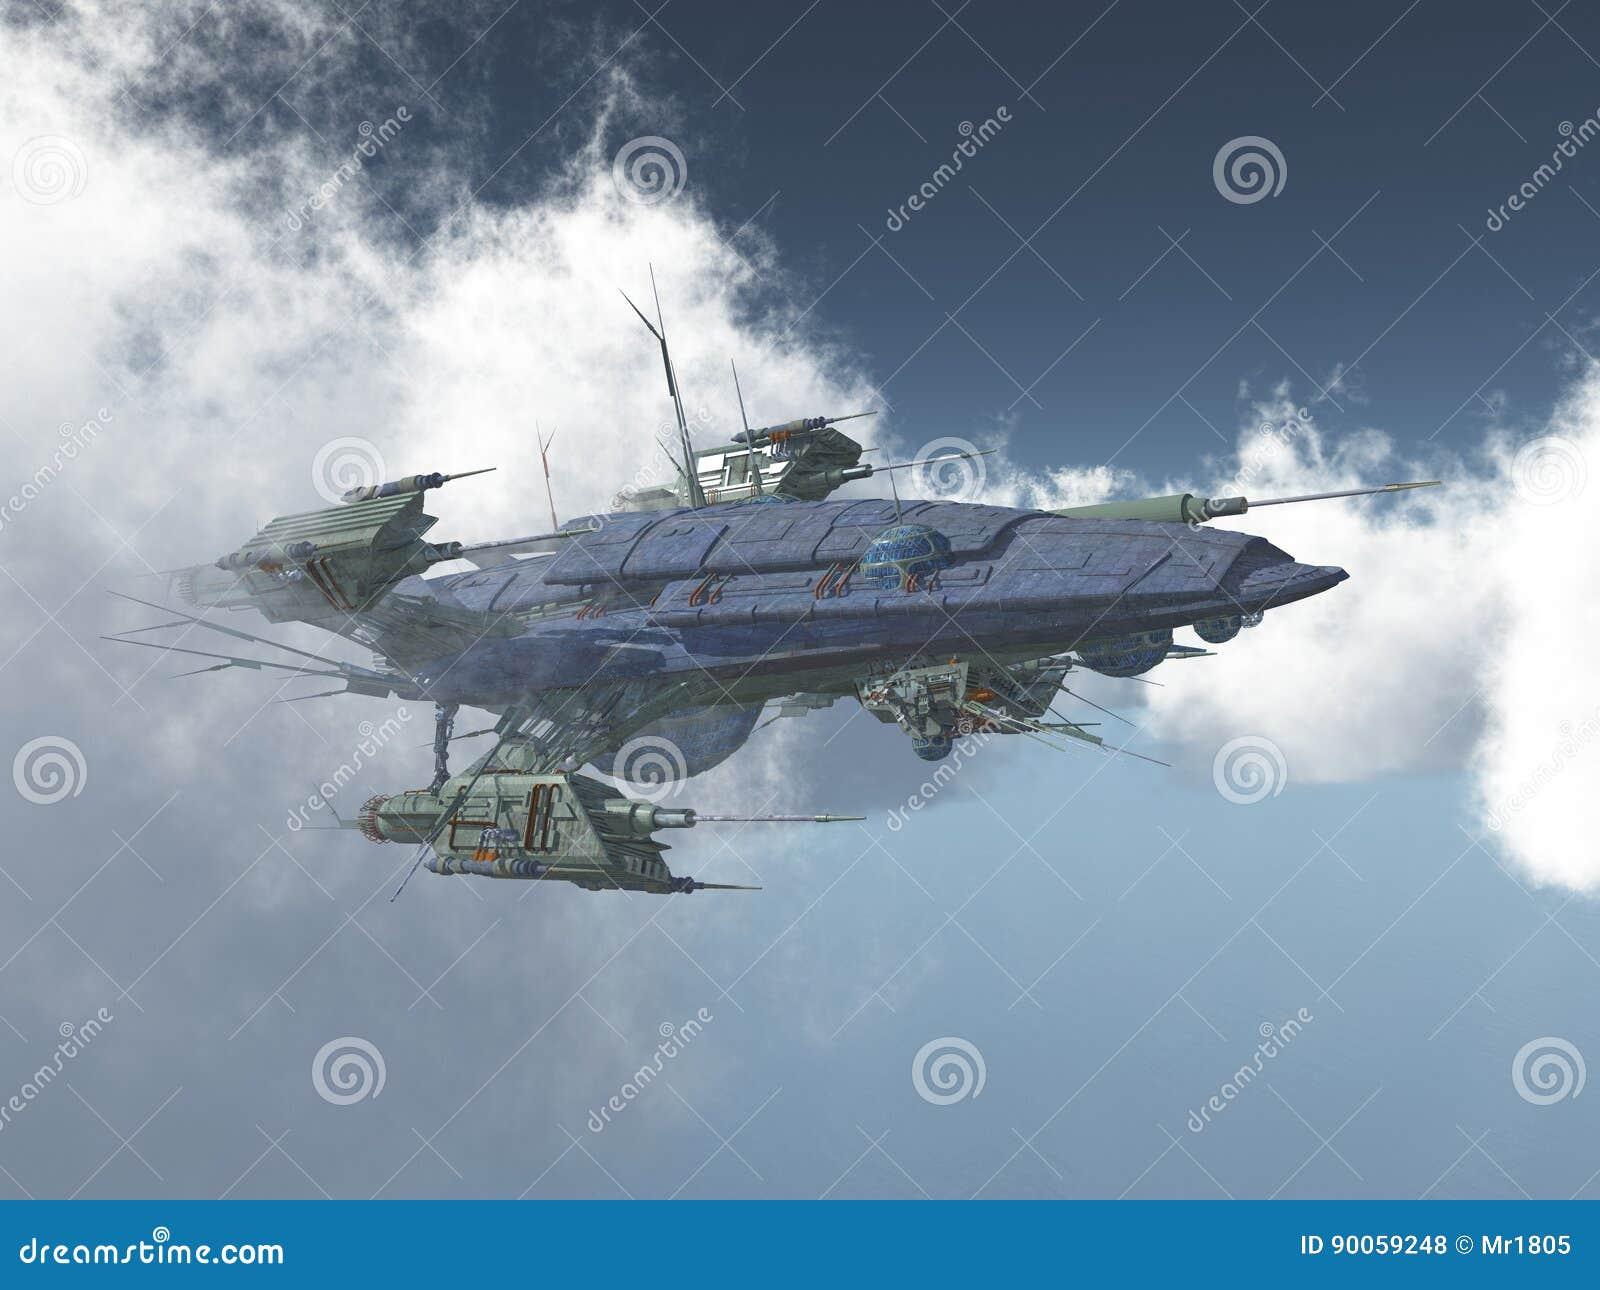 Veicolo spaziale enorme fra le nuvole